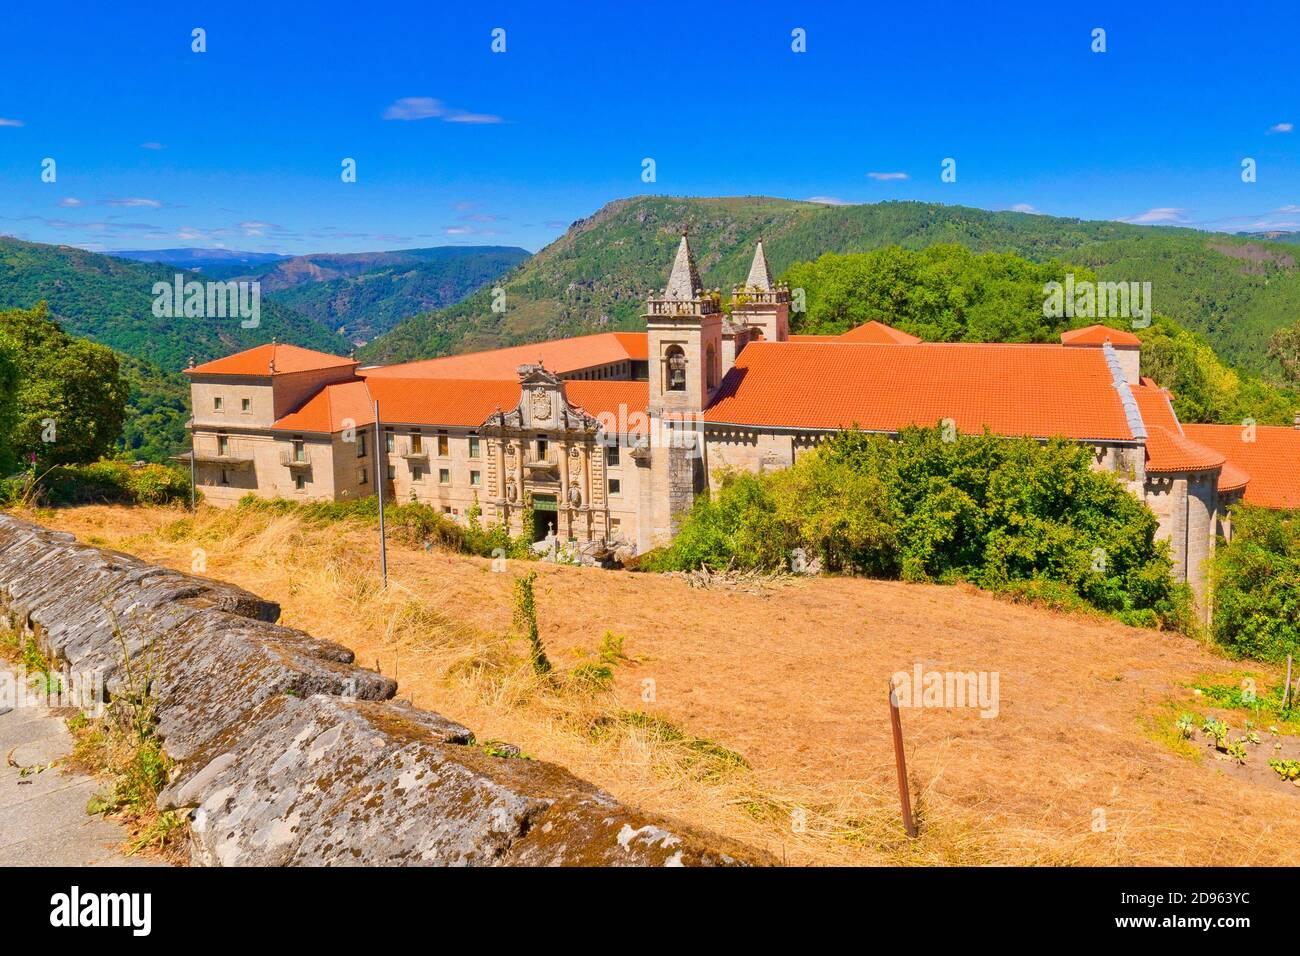 Monastery of San Estevo de Ribas de Sil, Spanish Property of Cultural Interest, Spanish National Heritage Site, Tourism Parador Spanish Luxury Hotel, Stock Photo